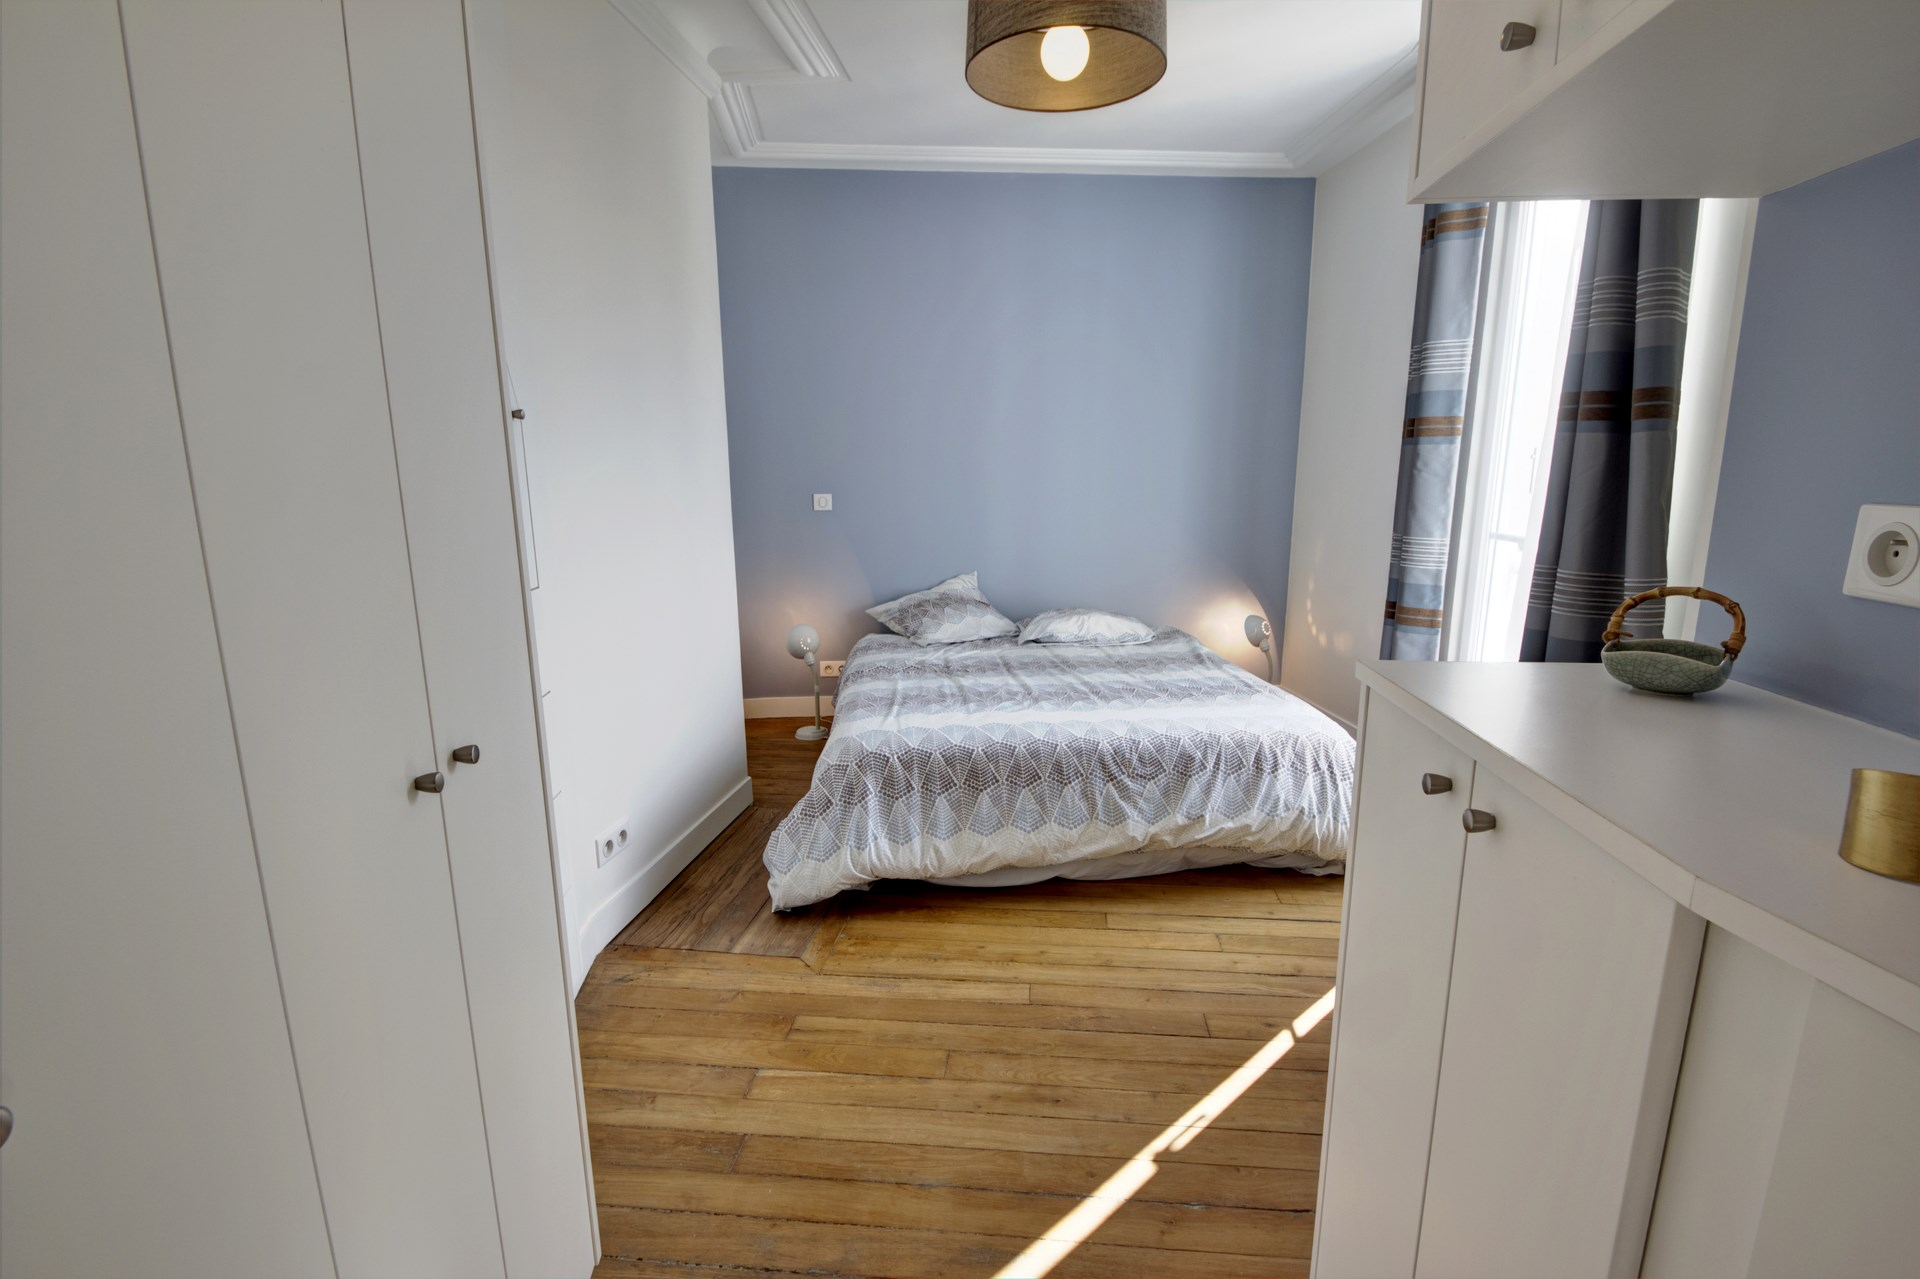 Шкафы в однокомнатной квартире